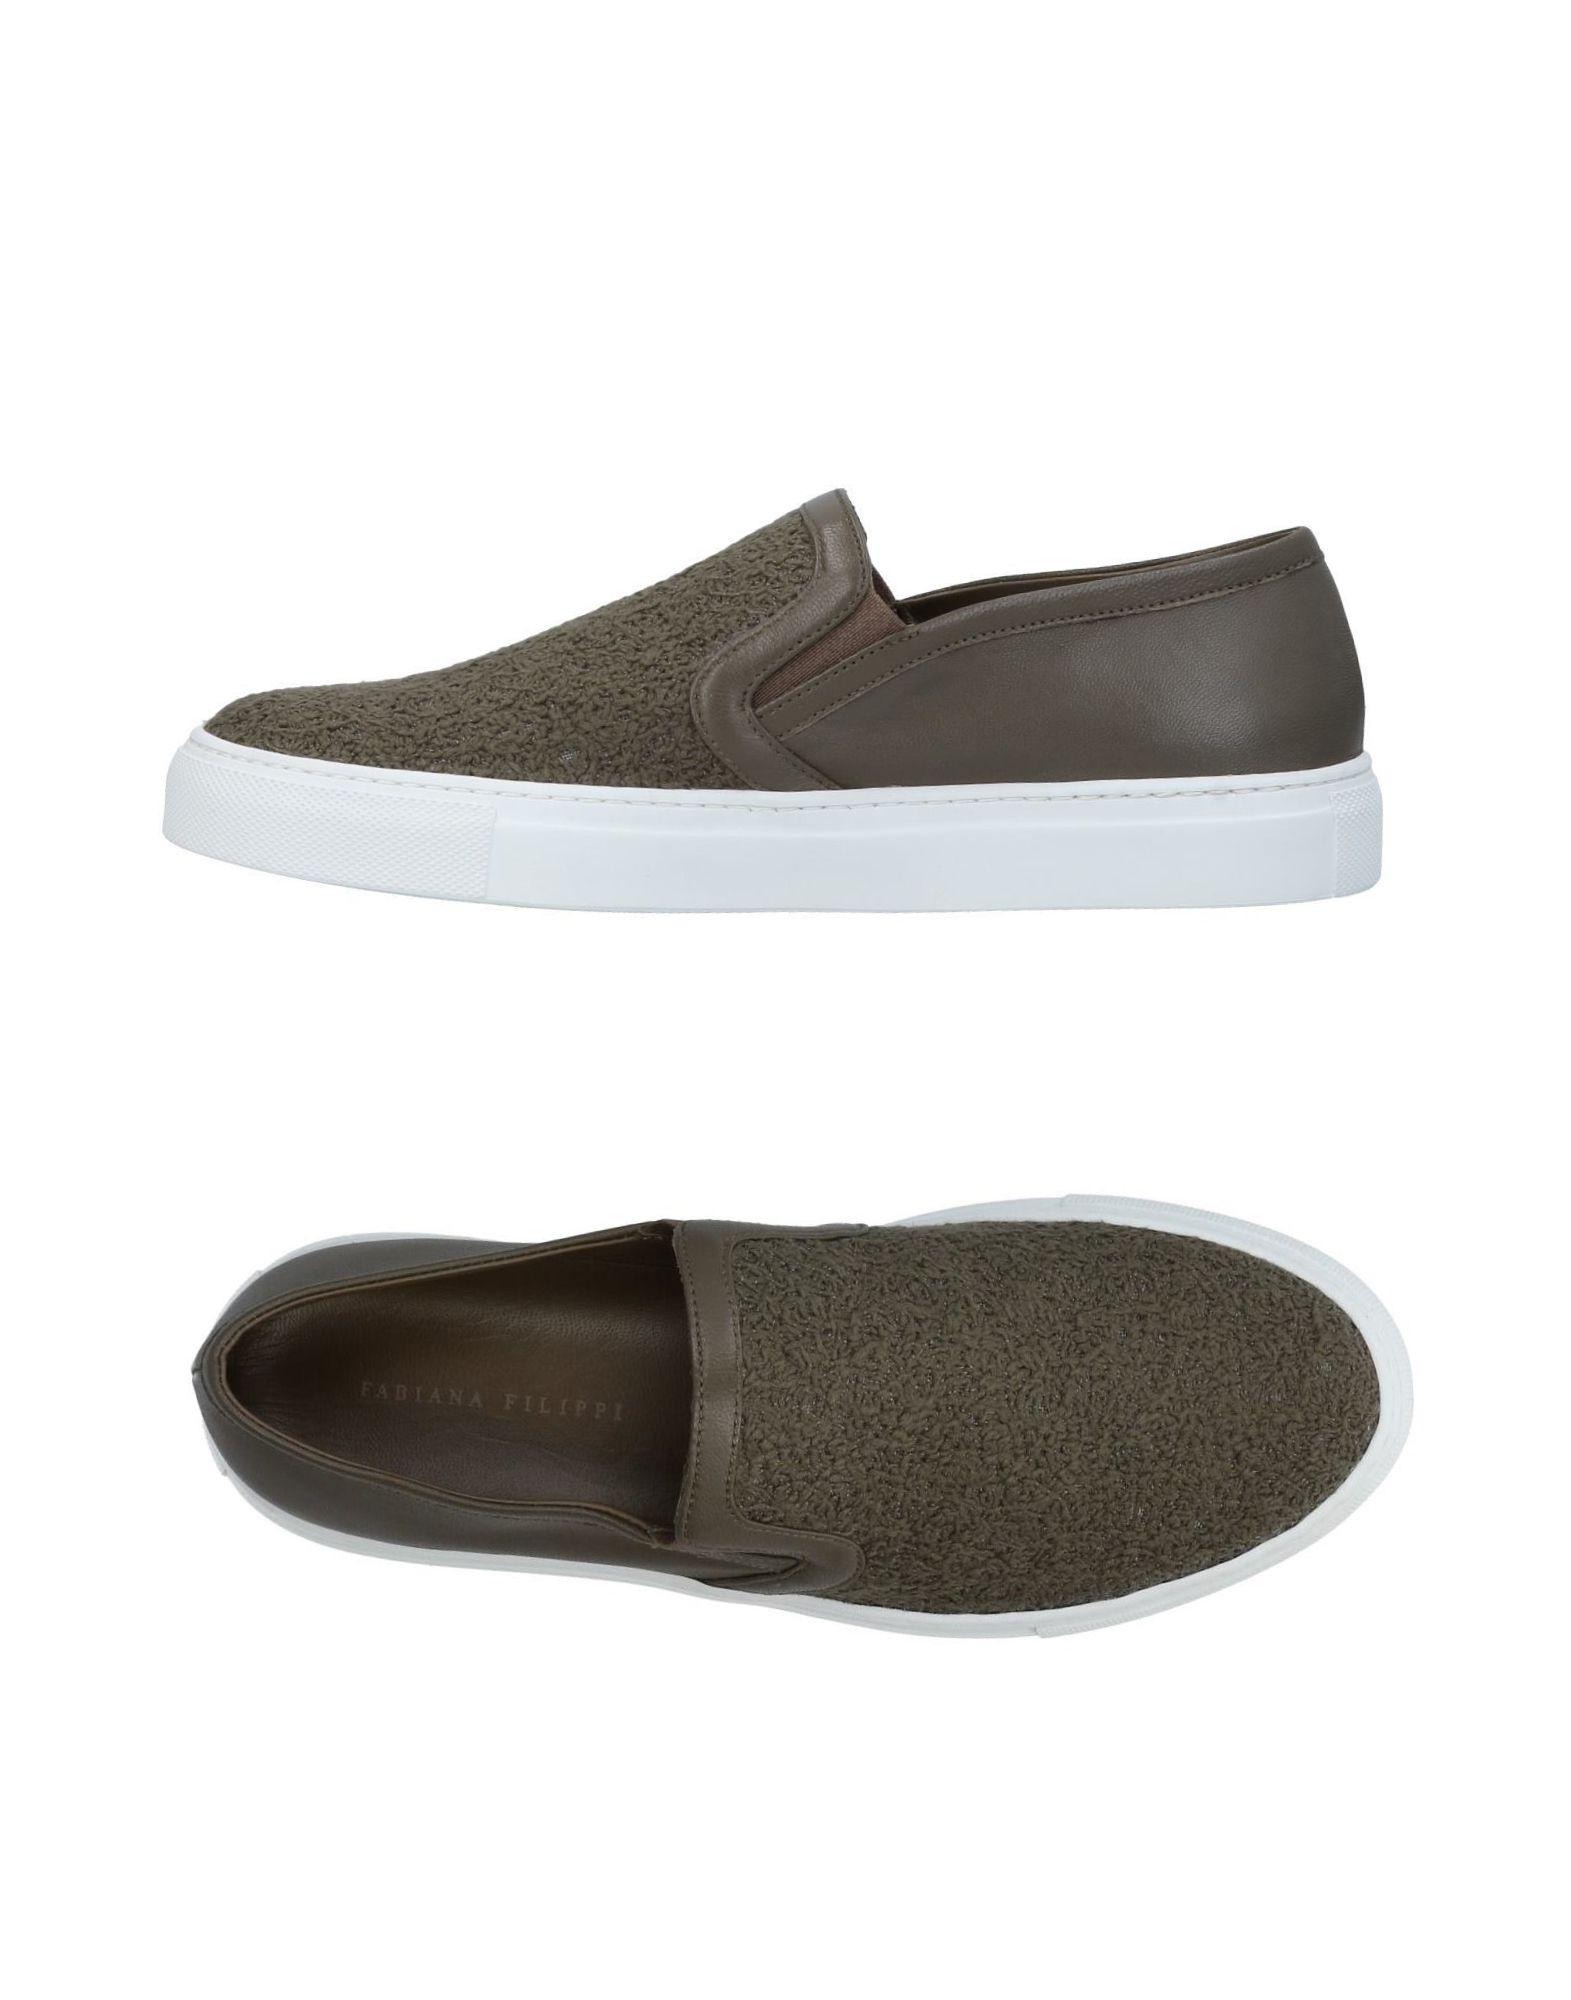 Gut um billige Damen Schuhe zu tragenFabiana Filippi Sneakers Damen billige  11443831JG 09e2bc